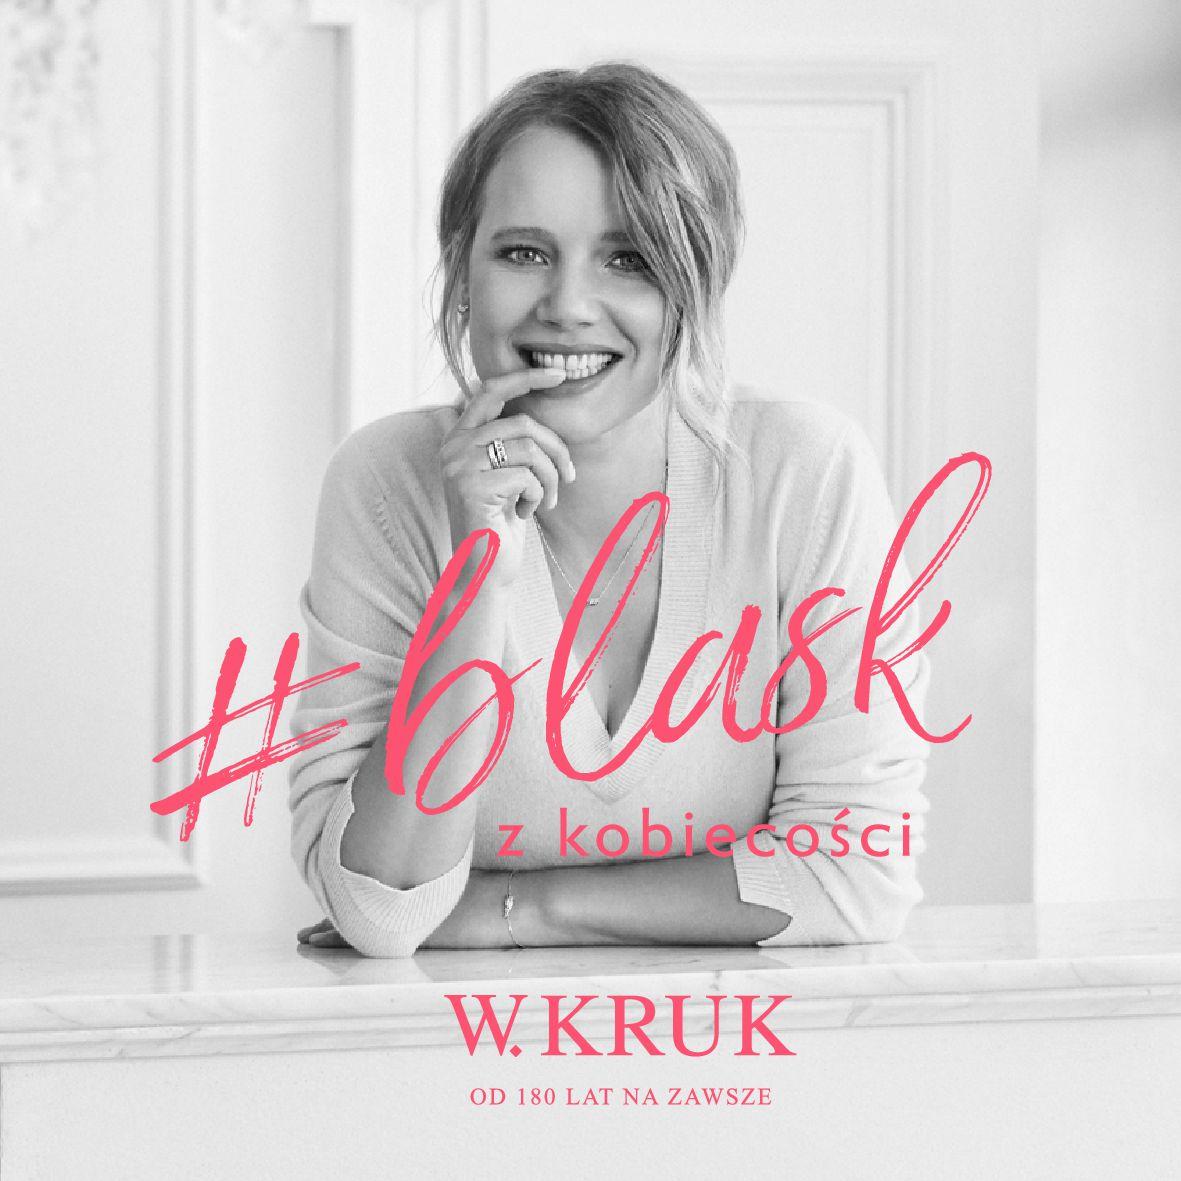 W. KRUK:  Katalog - Kolekcja Blask 16.02.2021